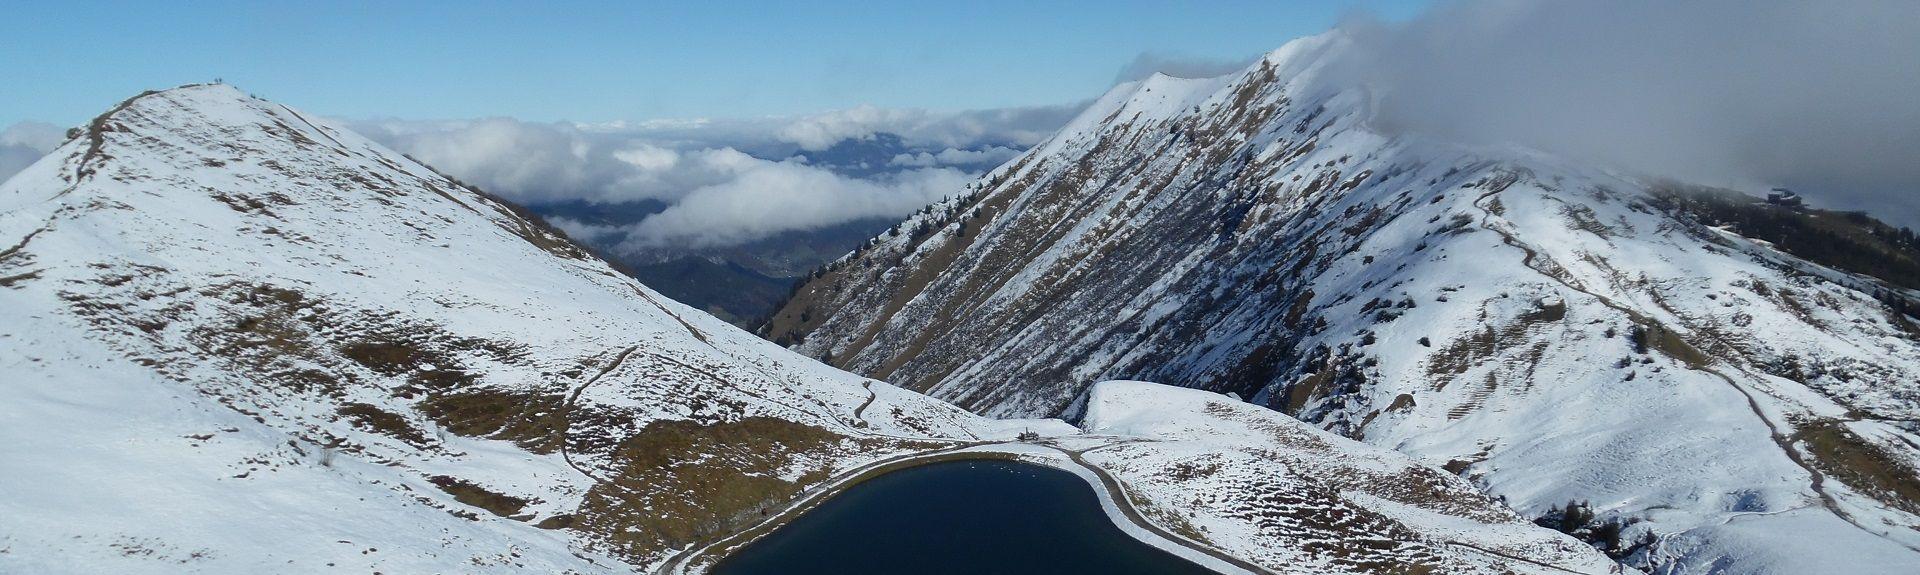 Lech am Arlberg, Vorarlberg, Austria